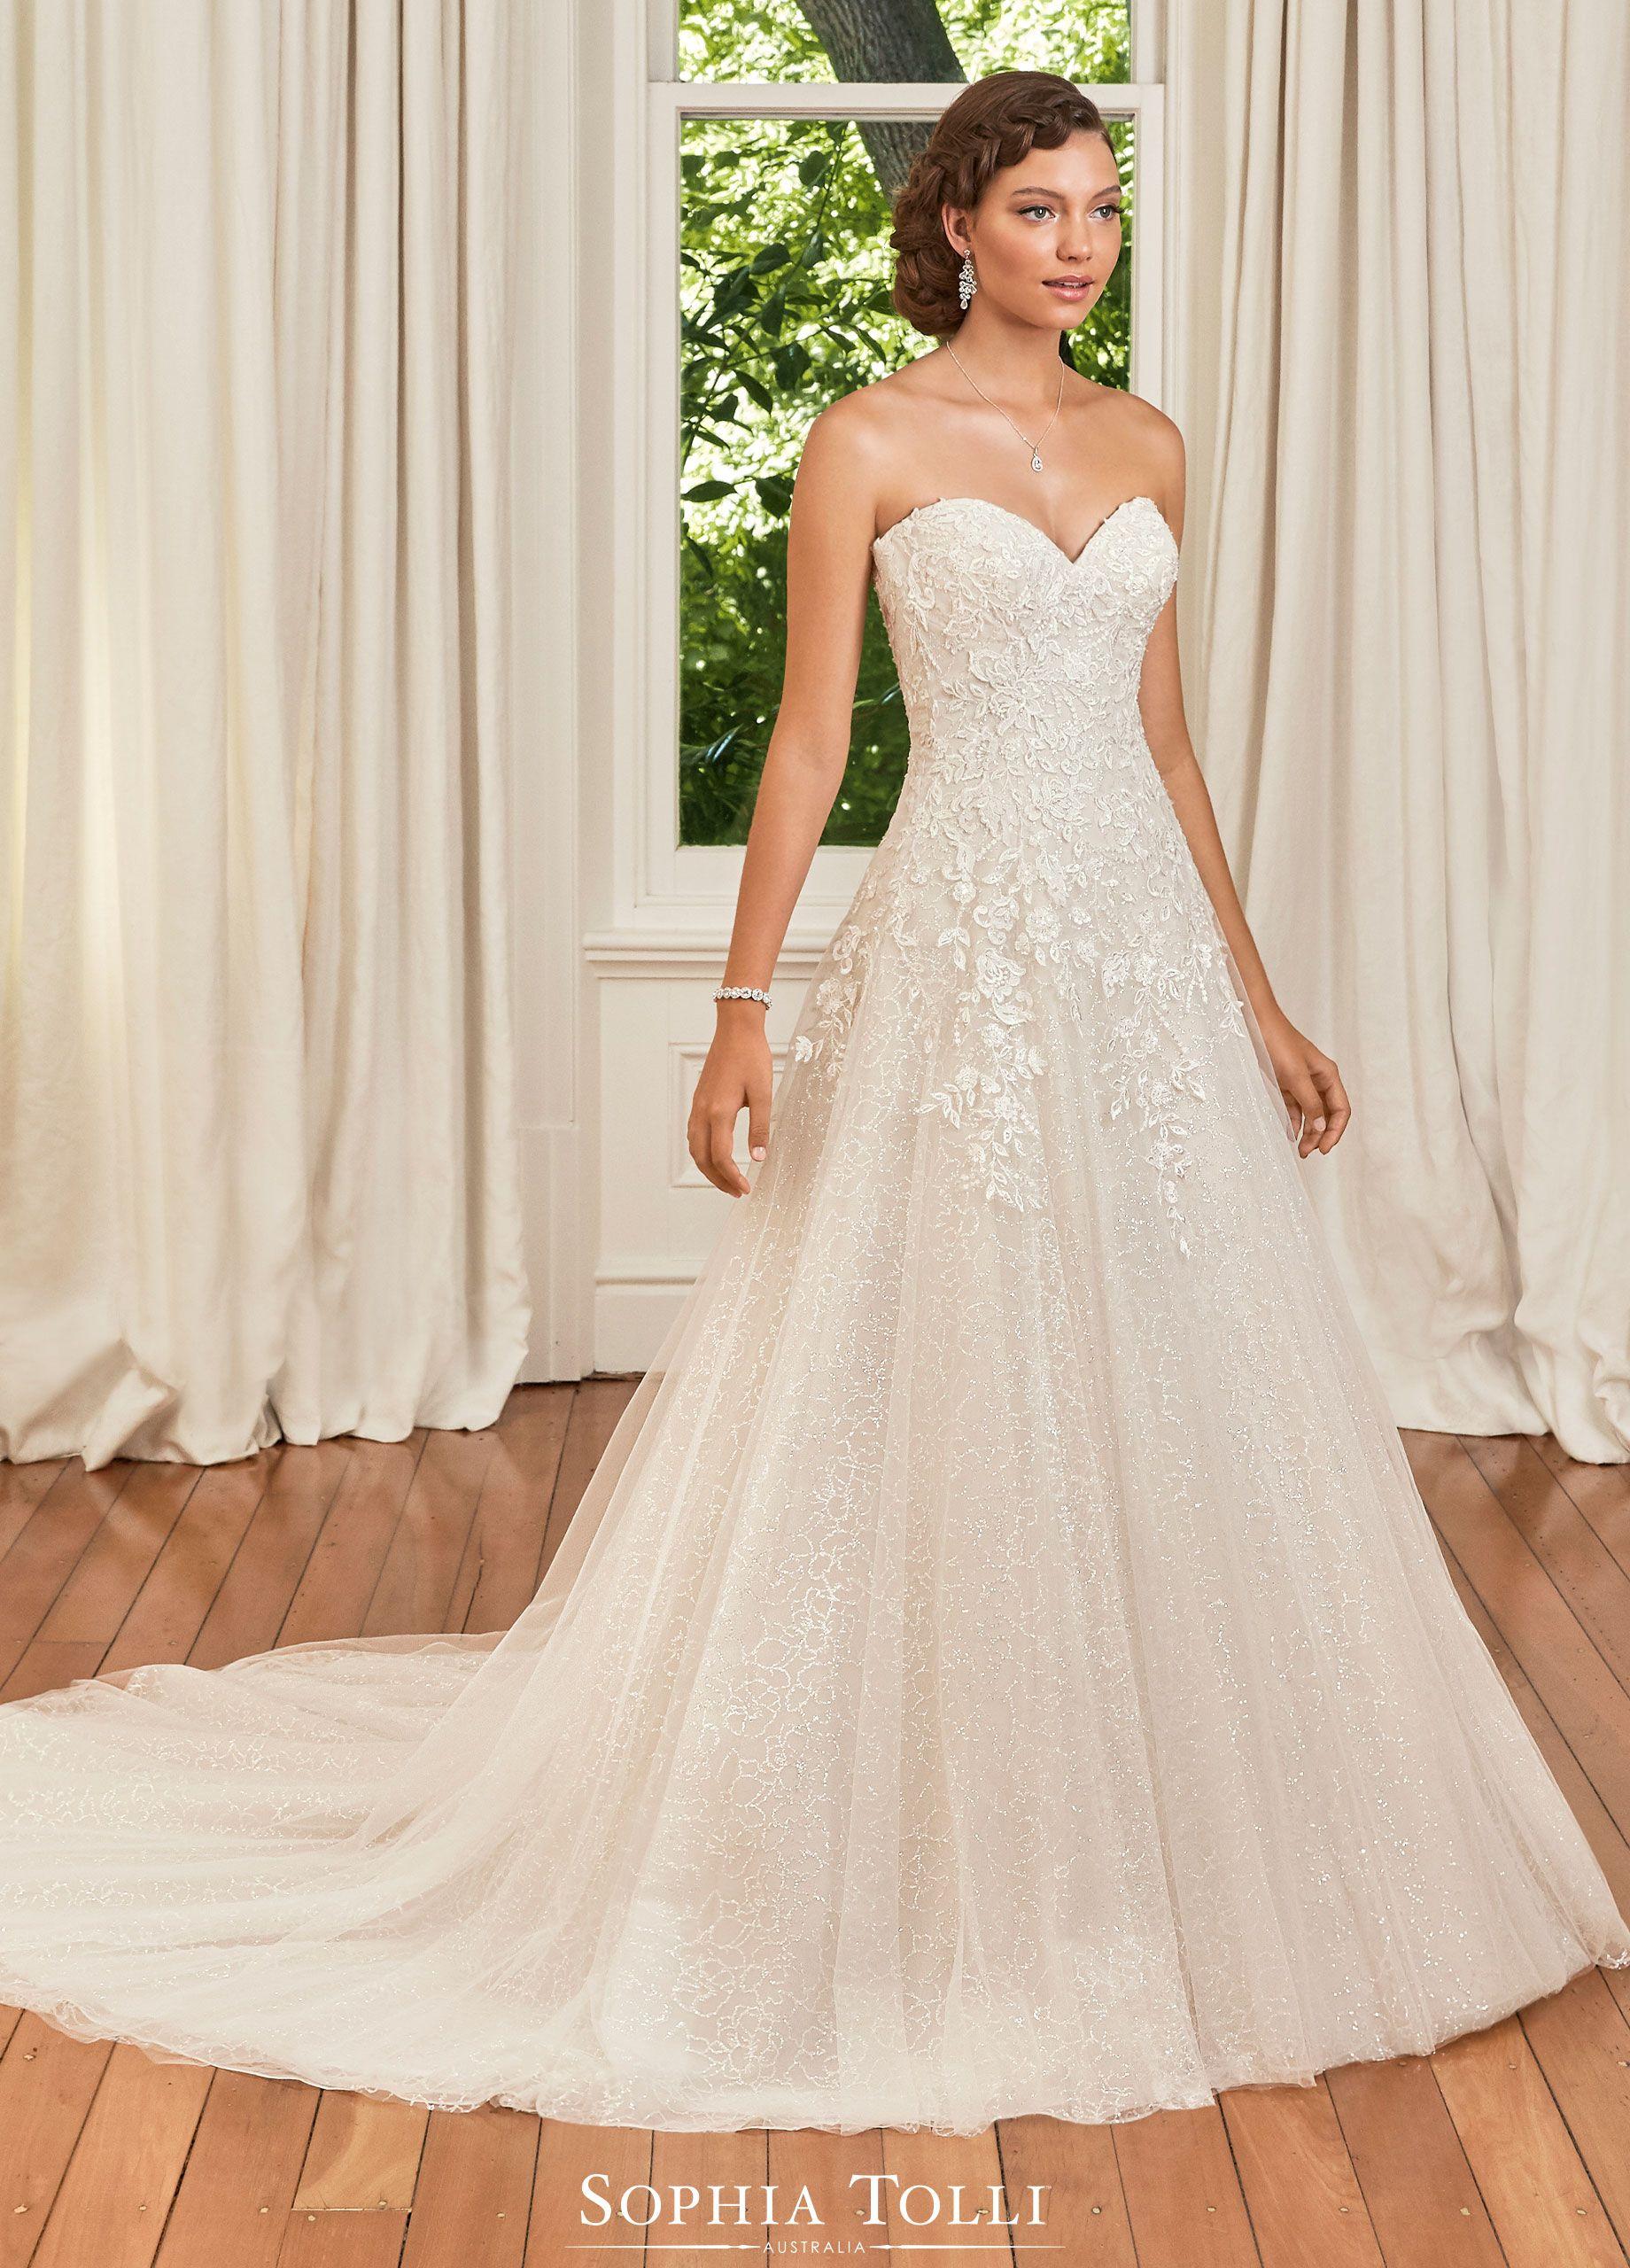 Sophia Tolli Avery Sophia Tolli Drop Waist Wedding Dress Sophia Tolli Wedding Dresses Wedding Dresses [ 2560 x 1840 Pixel ]